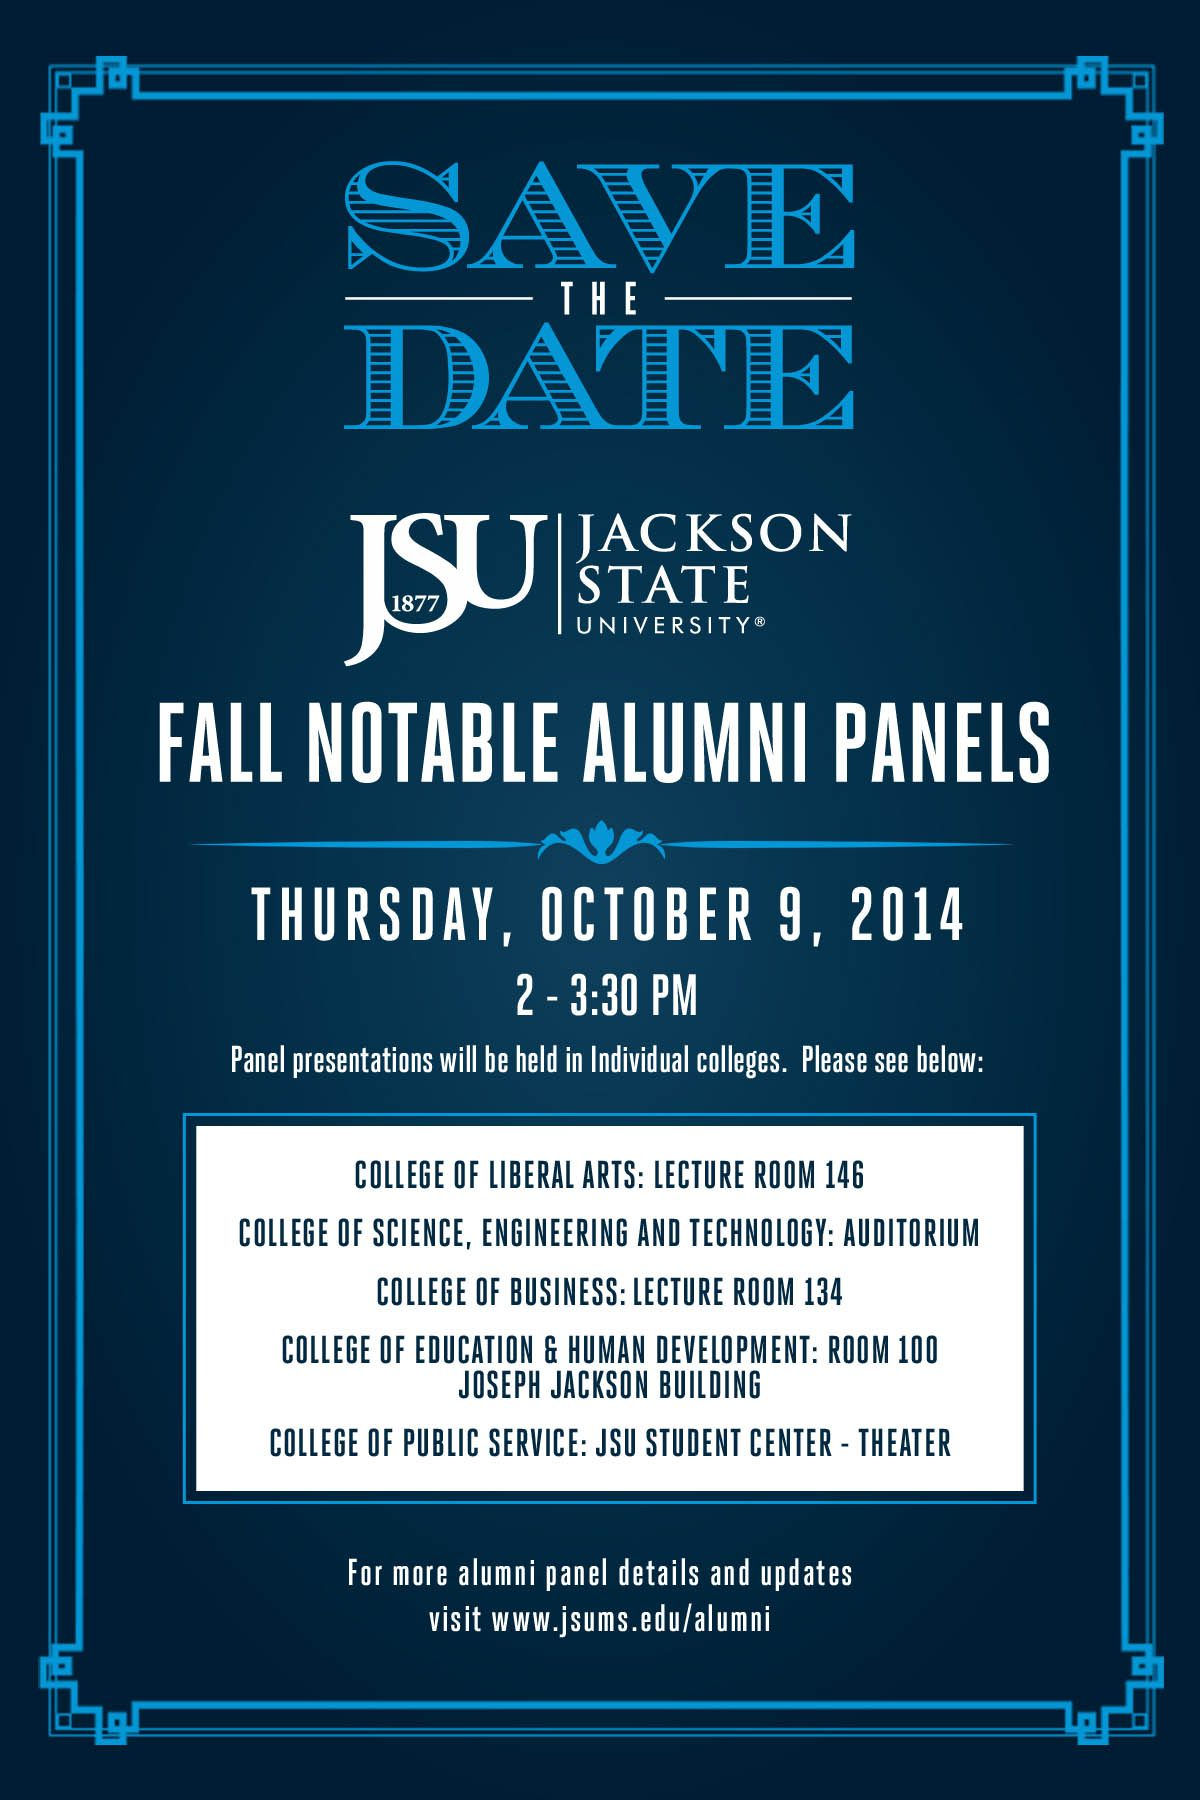 STD fall notable alumni panels